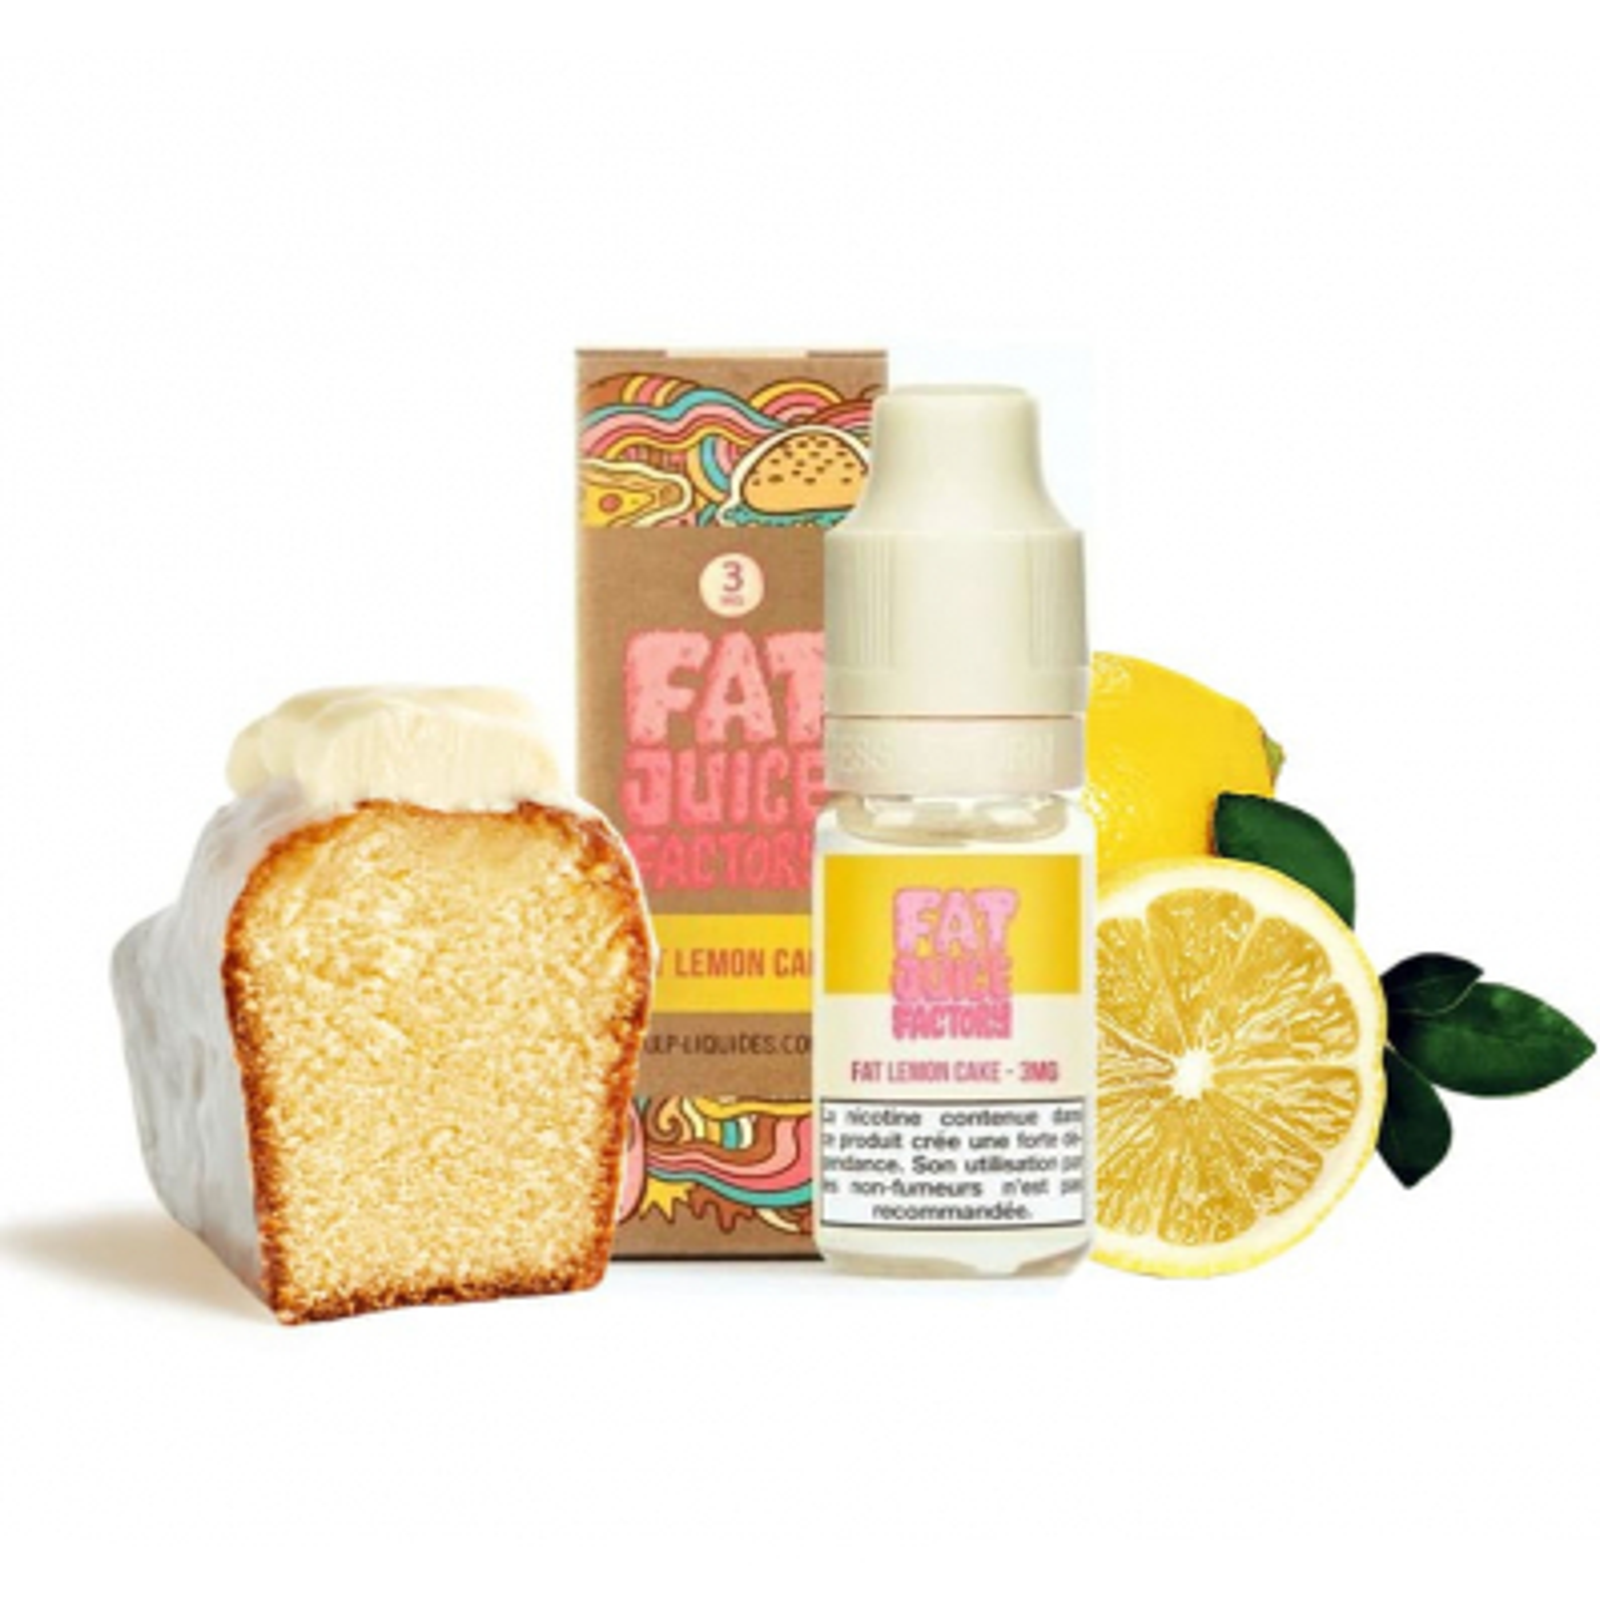 Fat Lemon Cake 10ml - Pulp